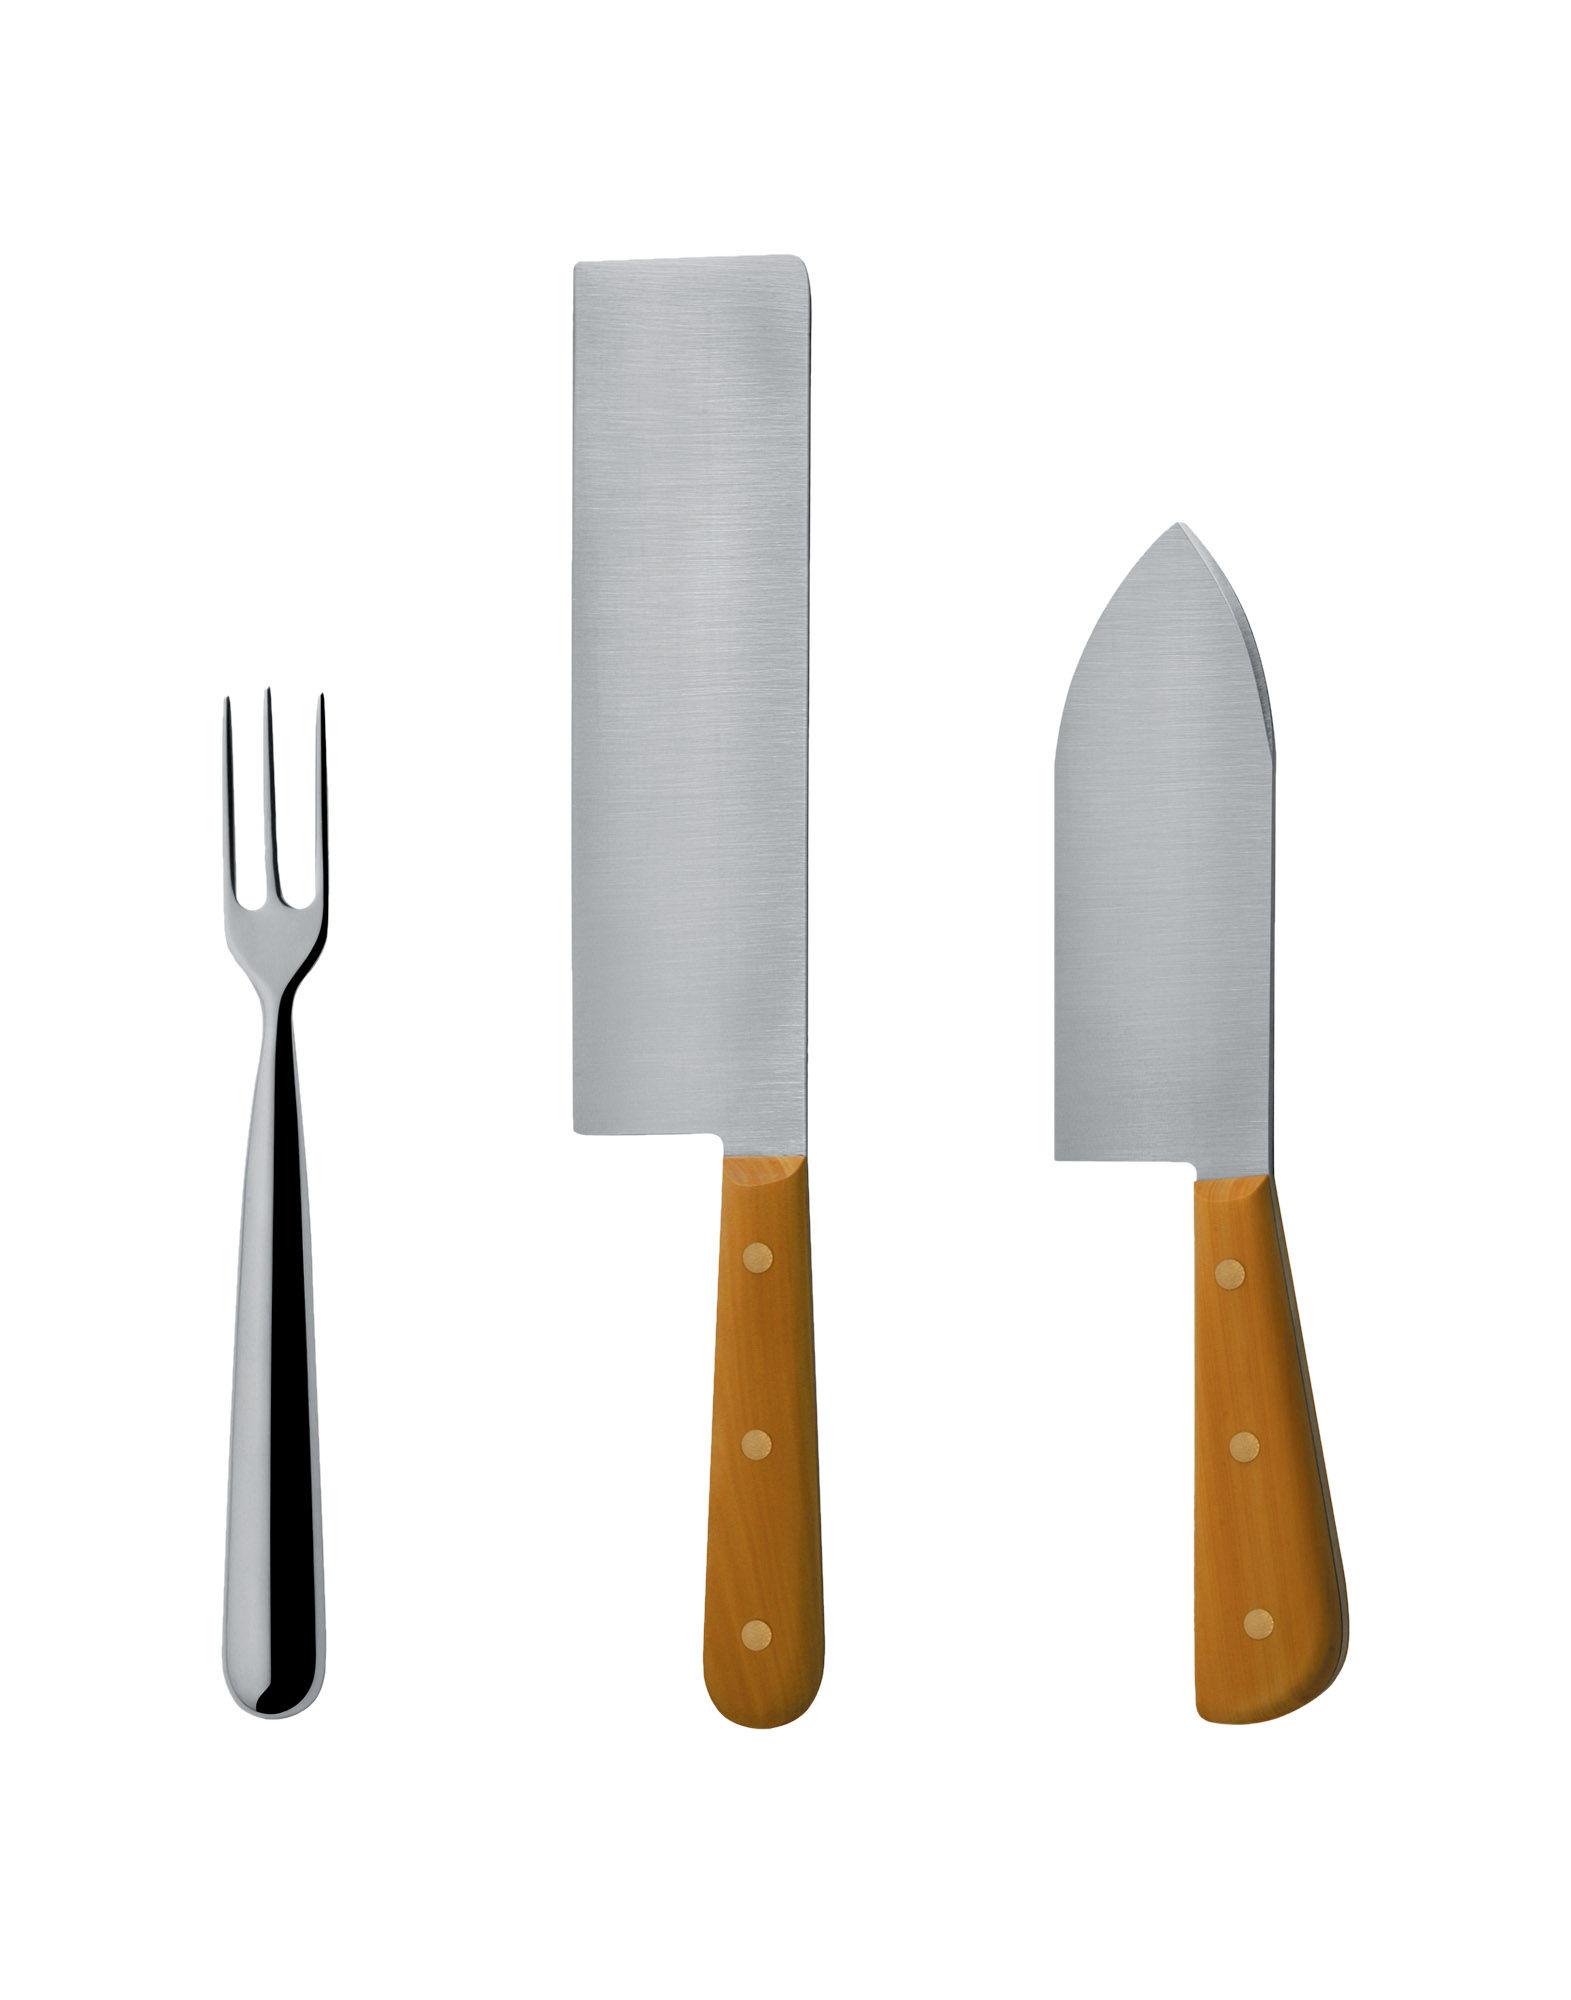 Alessi alessi tavola cucina utensili per la cucina for Utensili per la cucina